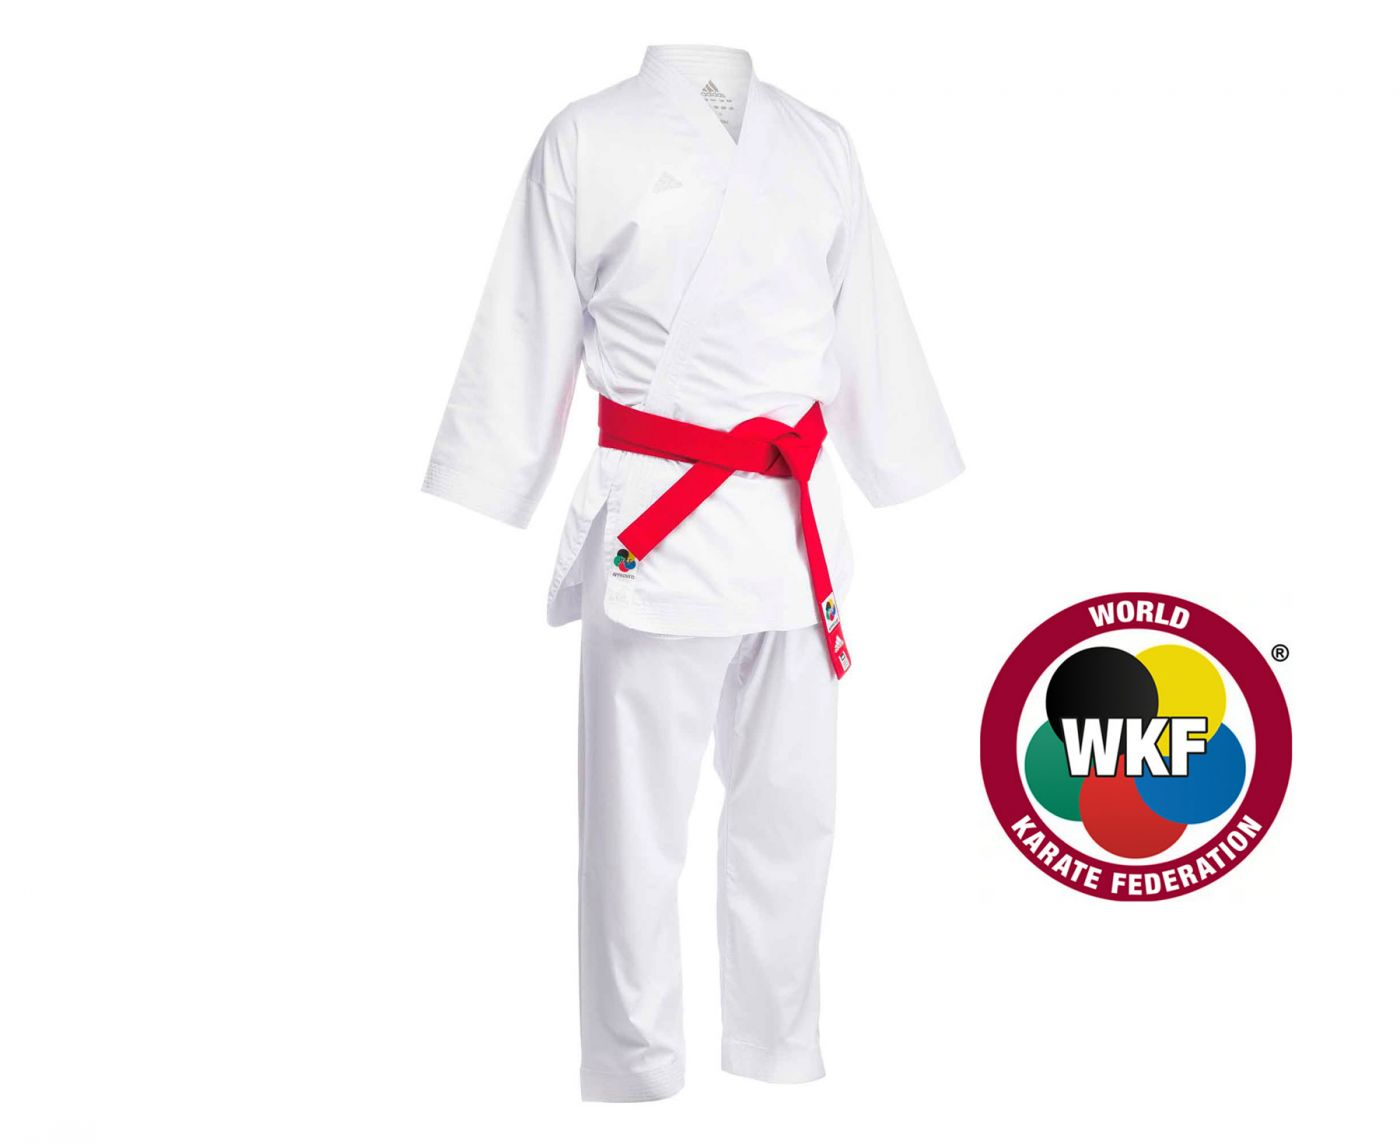 Кимоно для карате Adidas Adizero WKF белое, размер 180 см, артикул K0